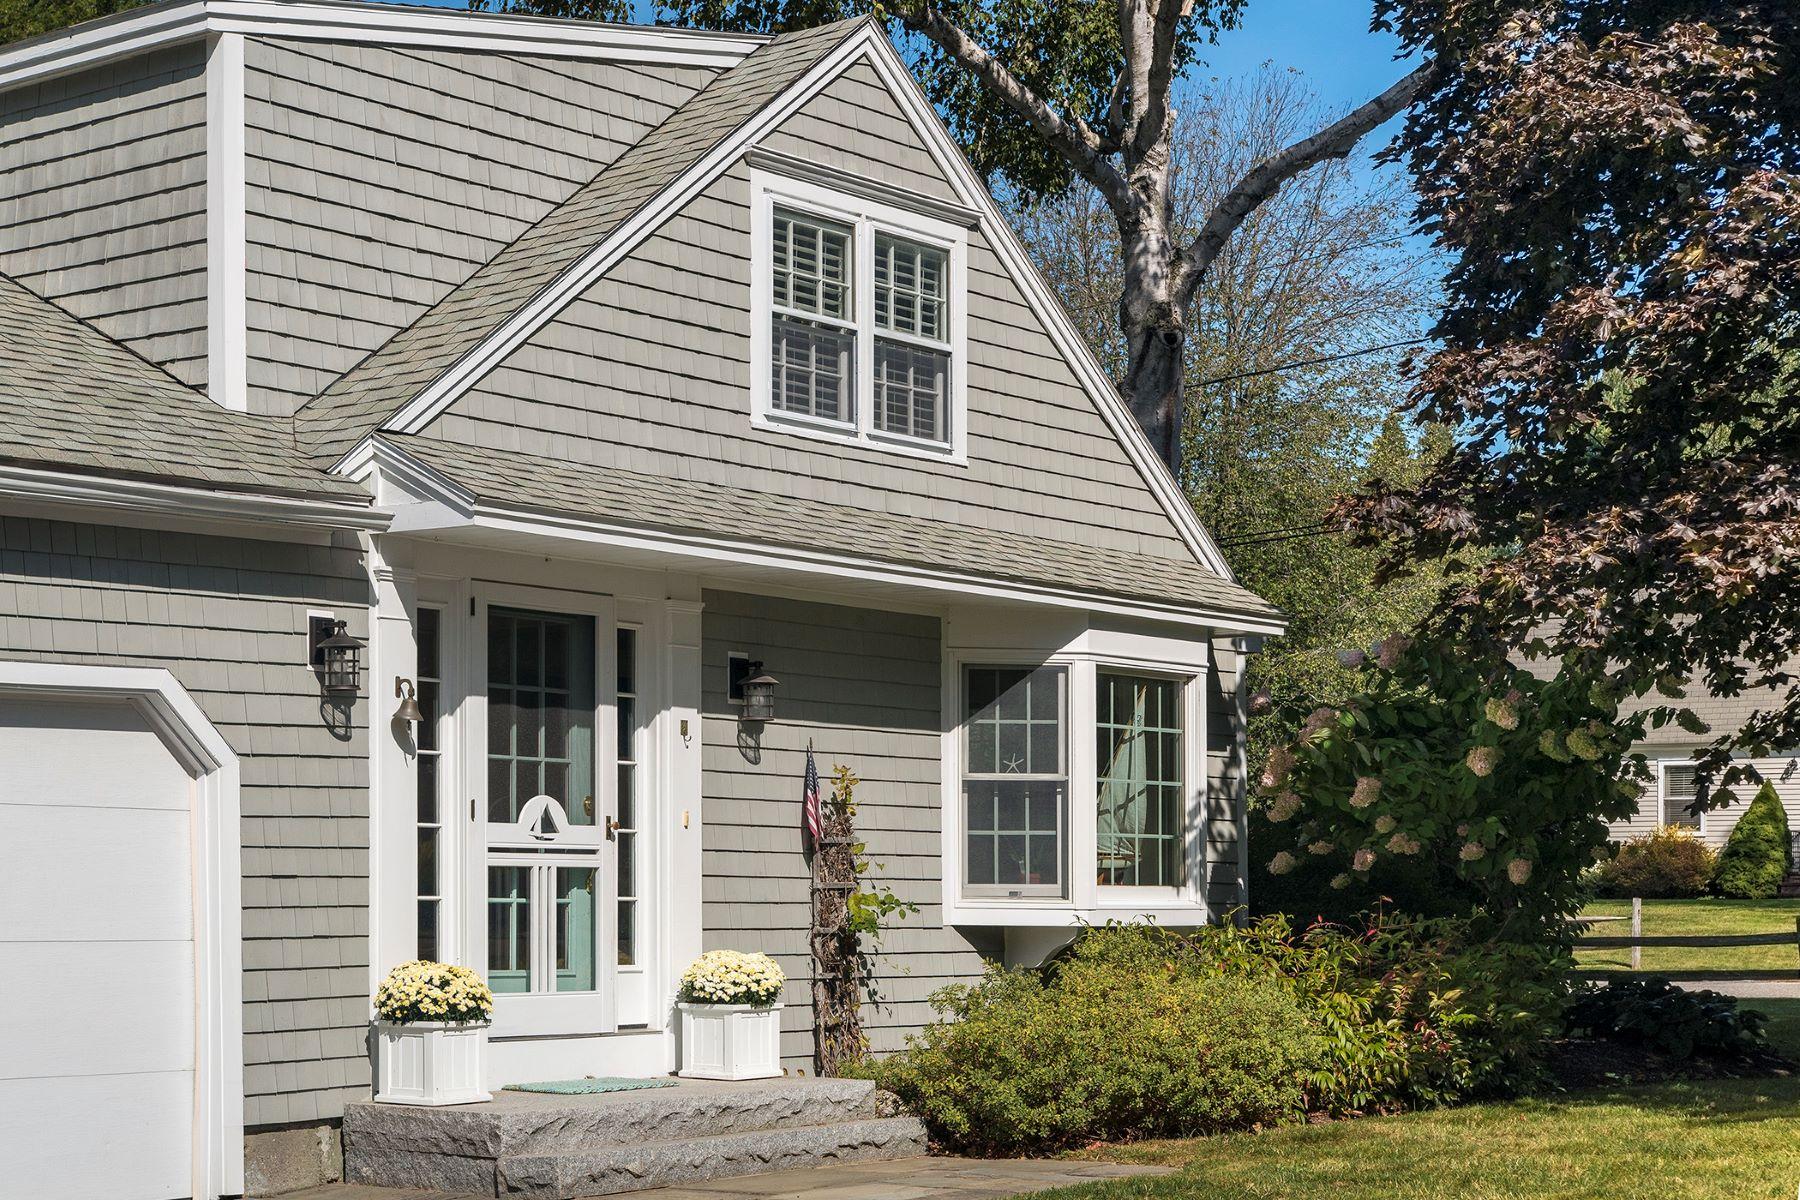 Single Family Home for Sale at 8 Mast Lane 8 Mast Lane Yarmouth, Maine 04096 United States